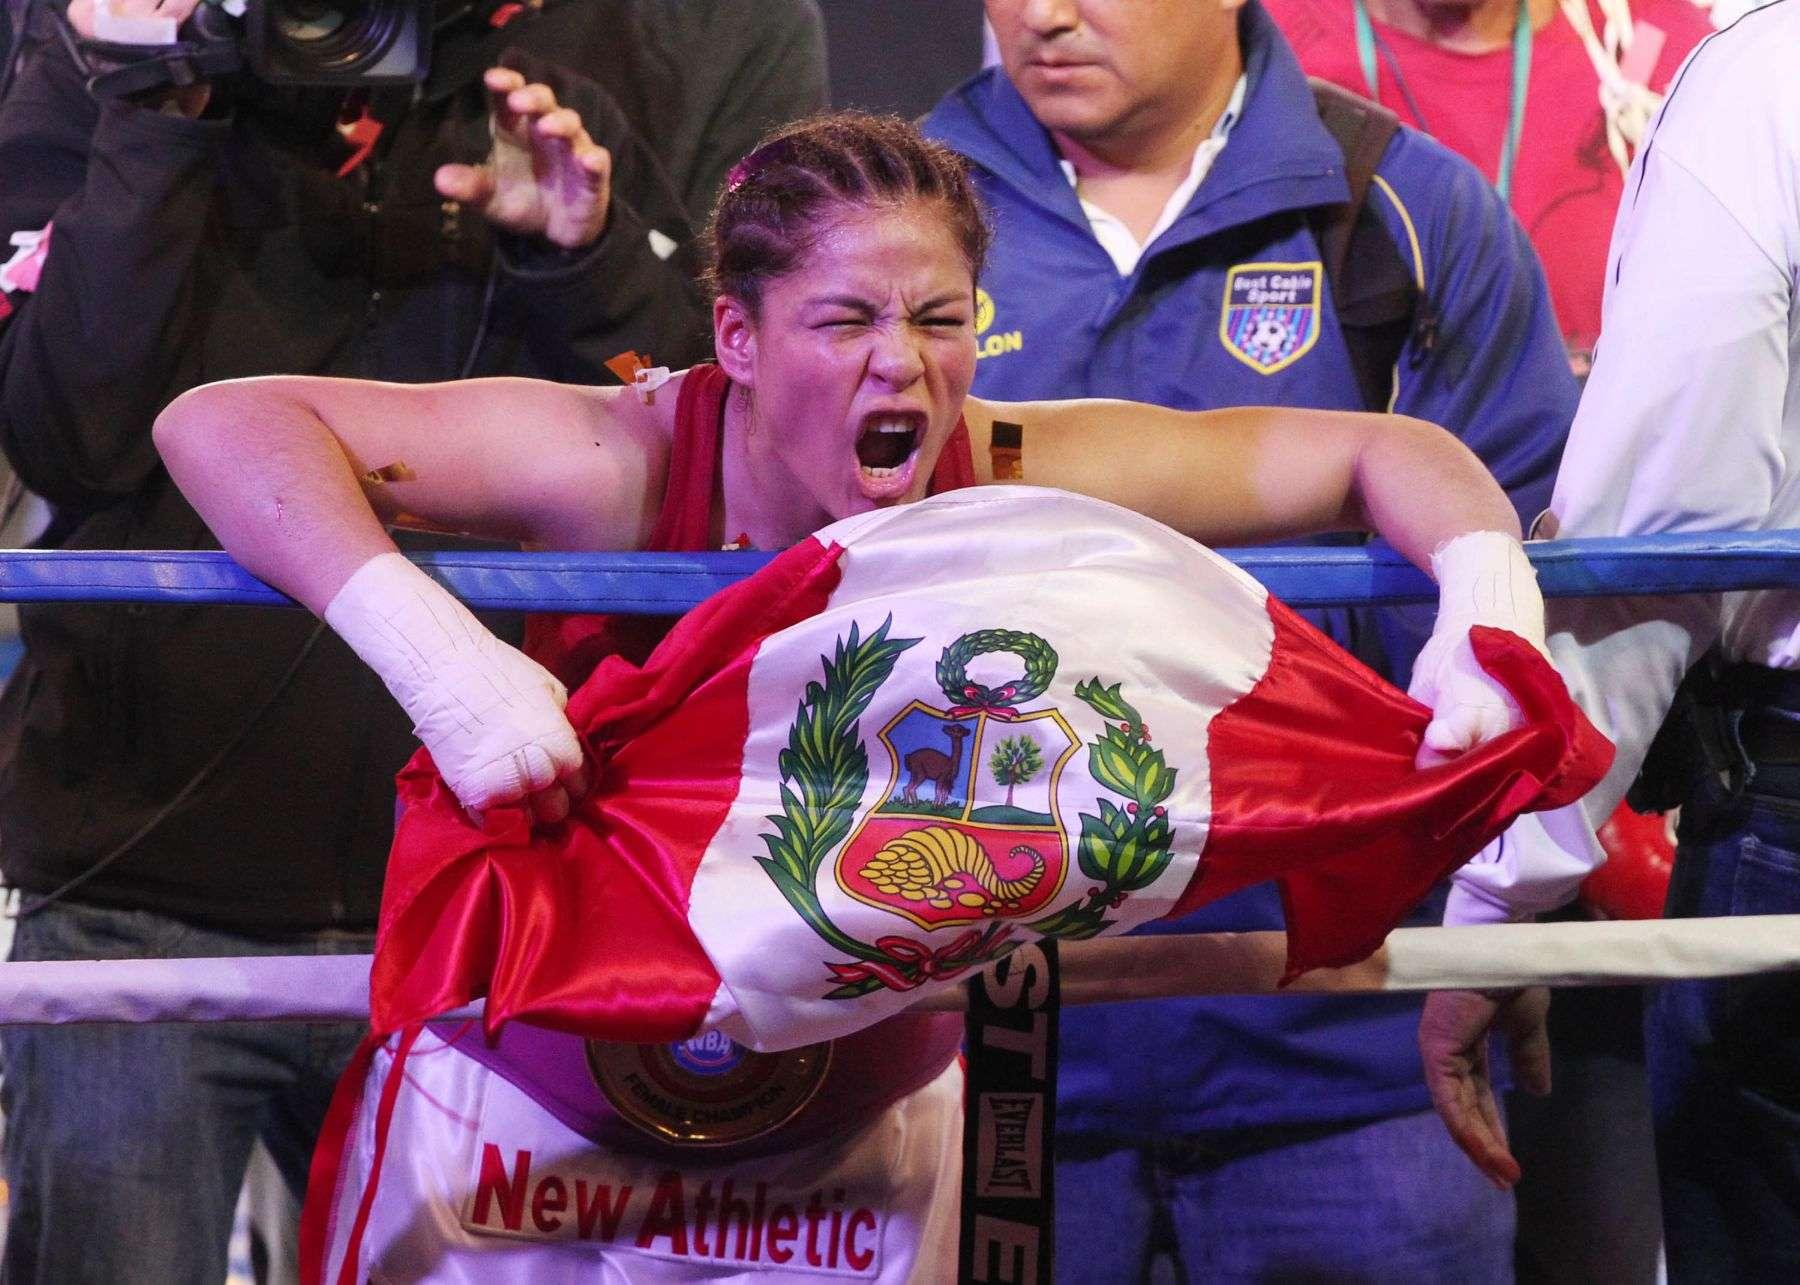 Linda Lecca ganó su título AMB en mayo la superar a la brasileña Simone da Silva. Foto: Andina